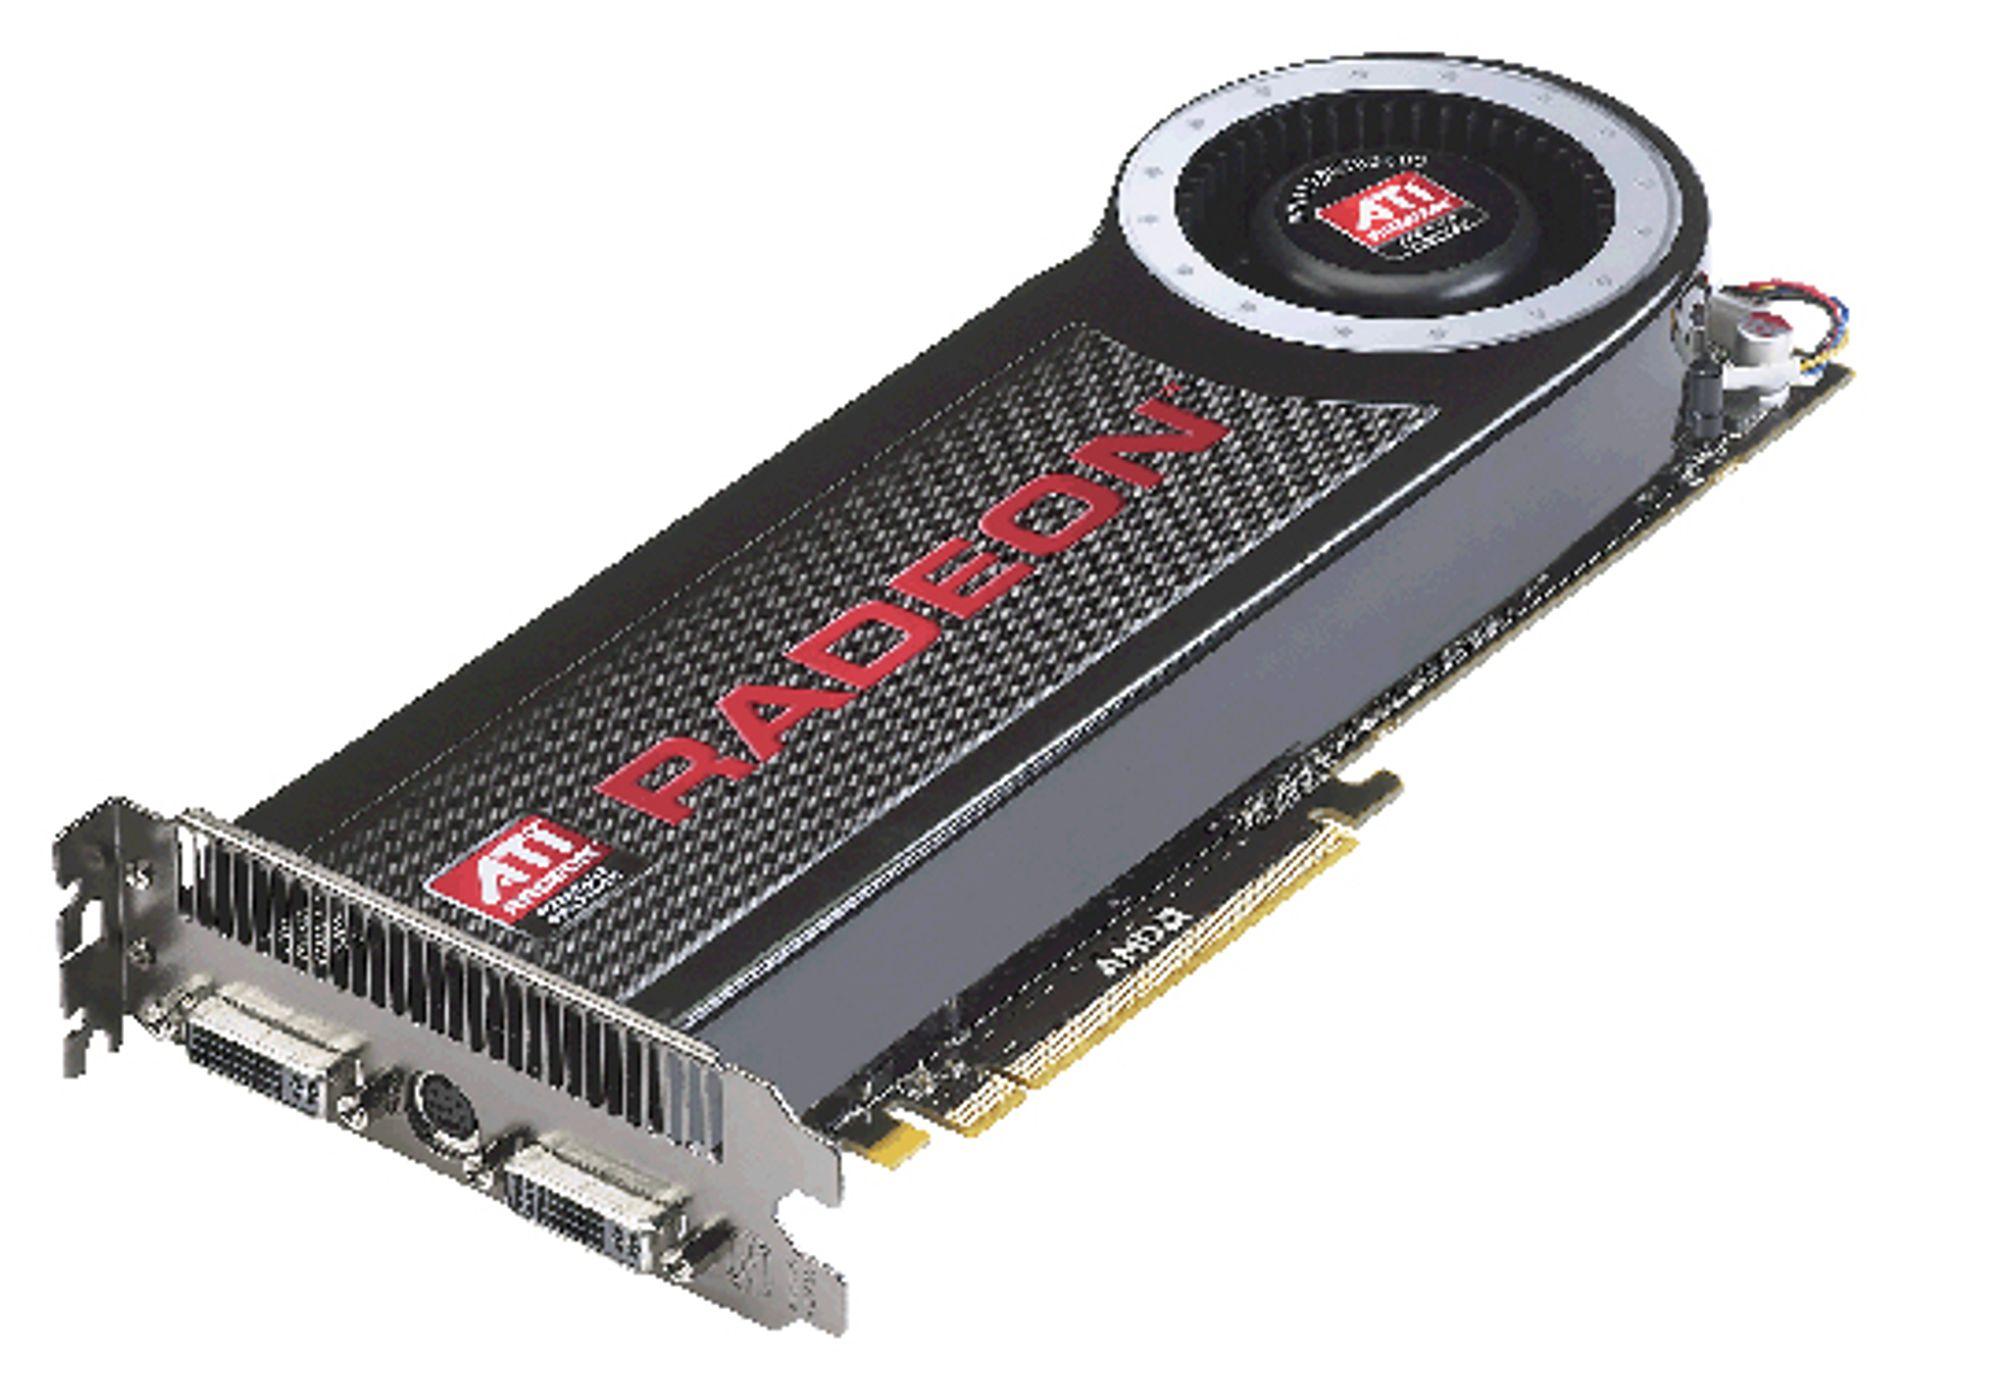 Illustrasjonsbilde: Radeon HD 4870 X2